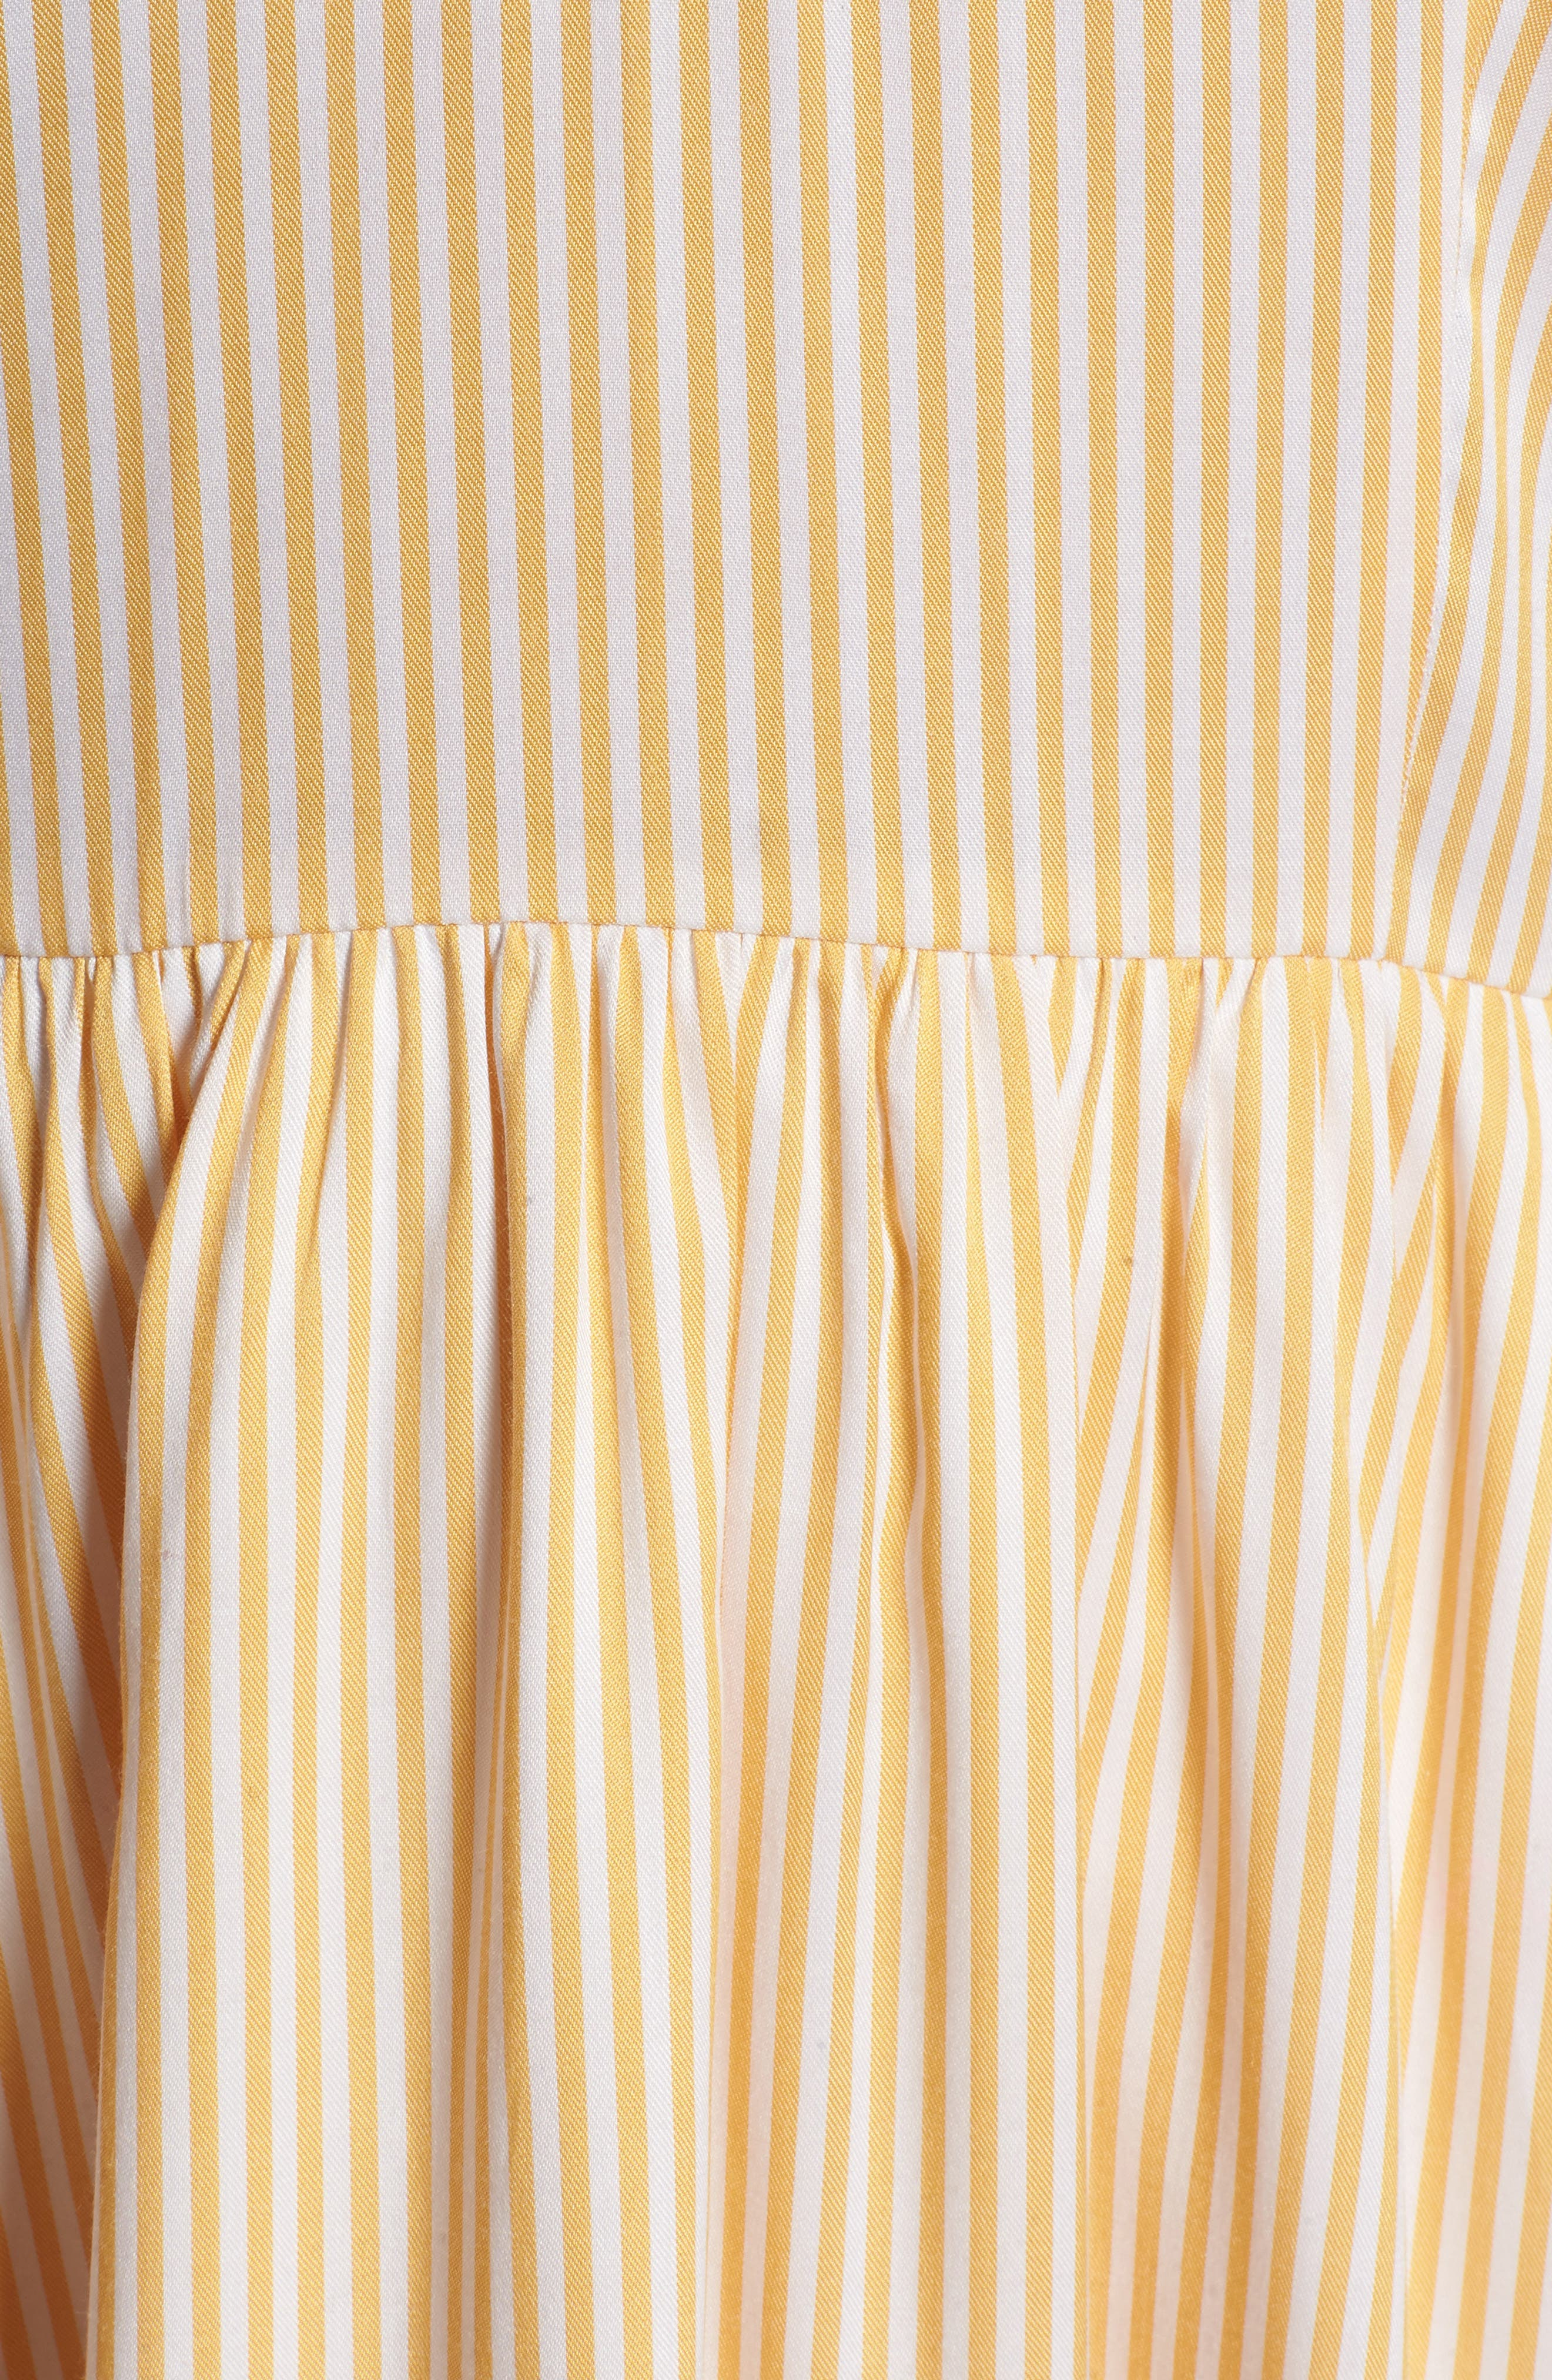 Ruffle Dress,                             Alternate thumbnail 6, color,                             Yellow Gleam Stratus Stripe